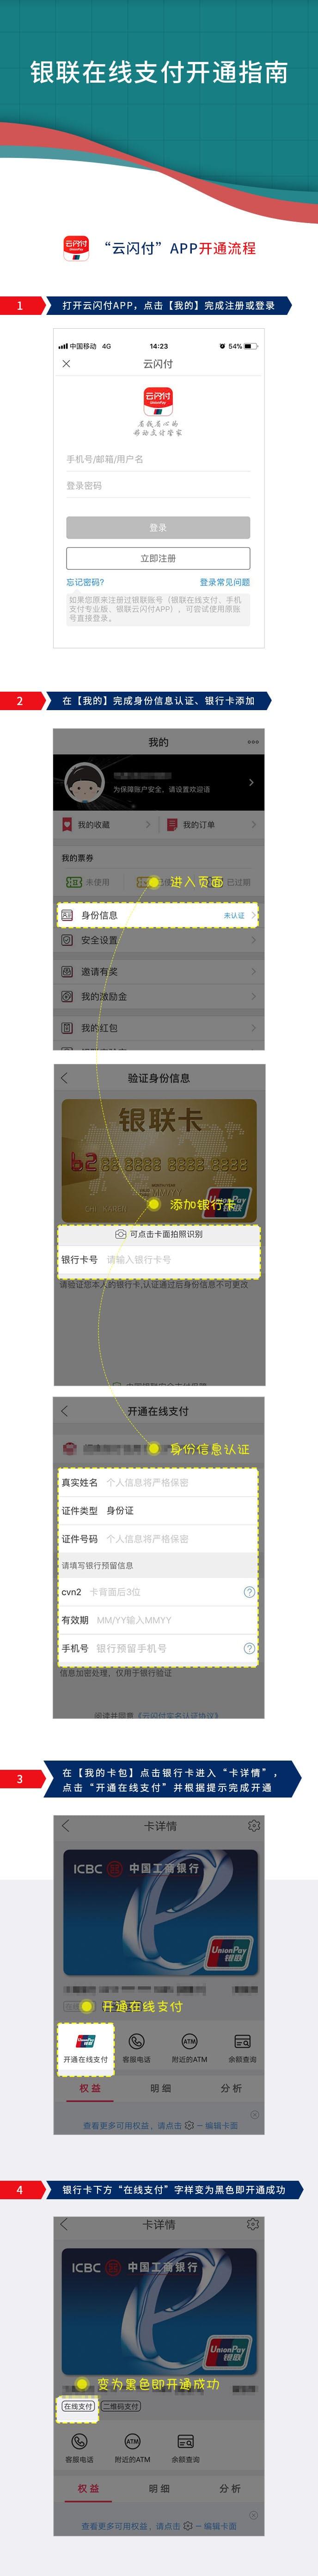 2web-内容-min (2).jpg